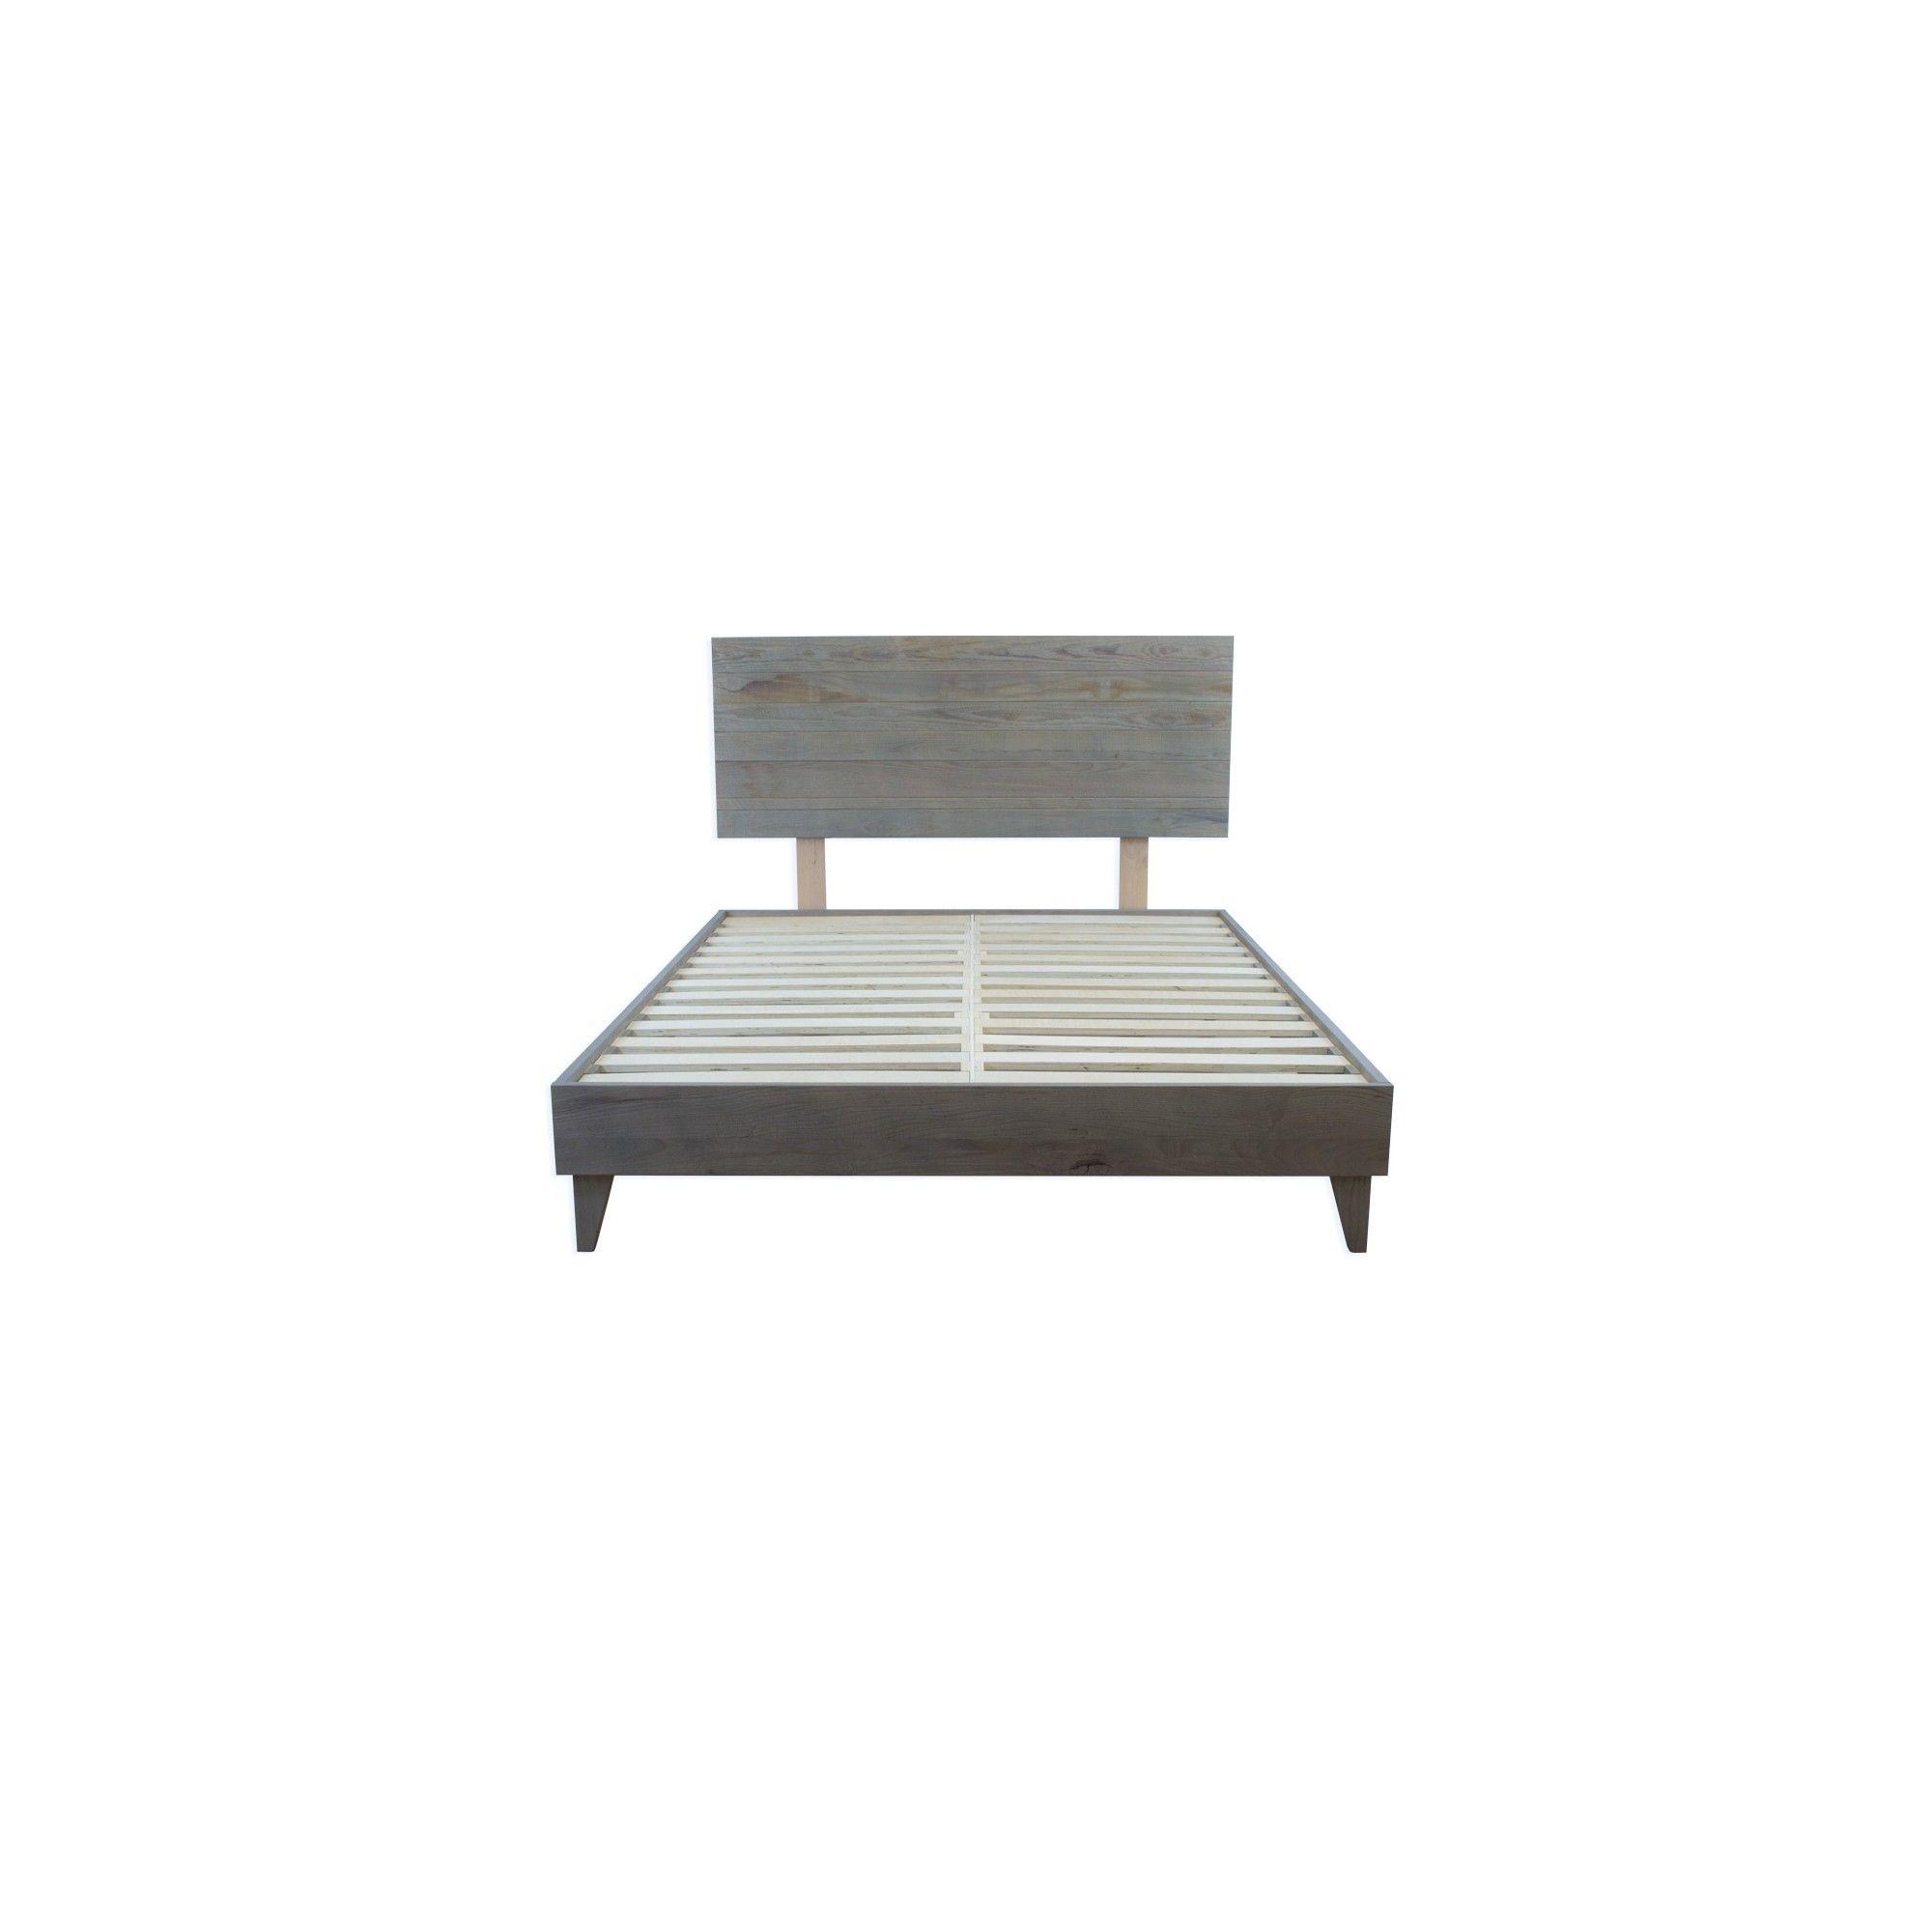 Eluxruy Barnwood Platform Bed Frame And Headboard California King